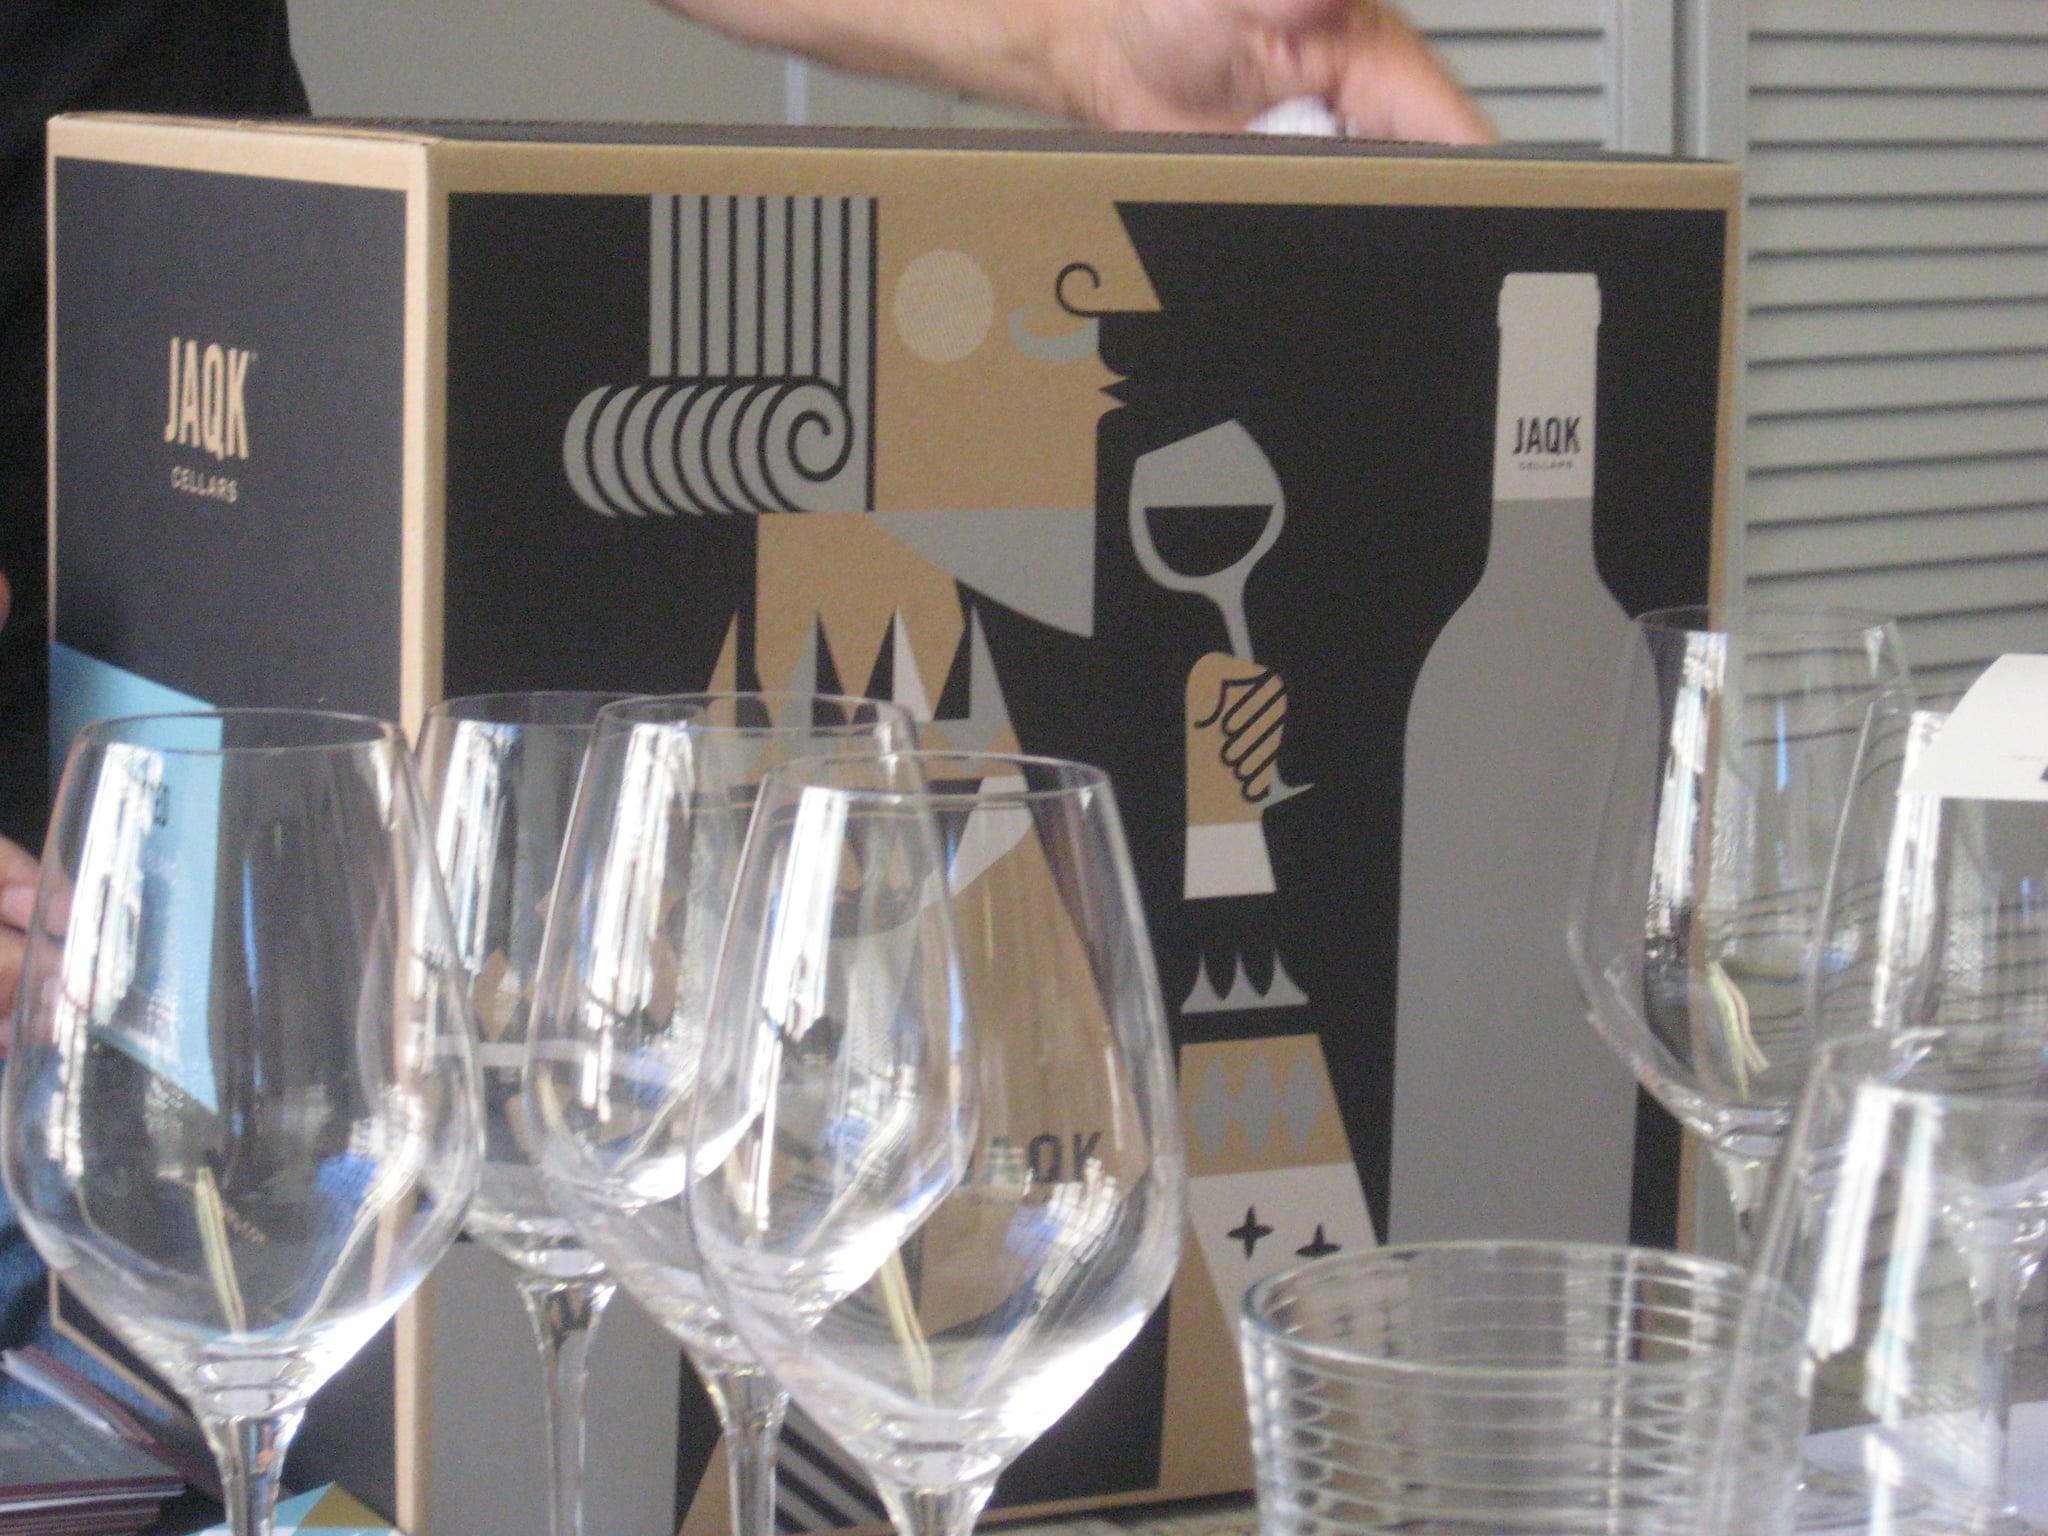 Empty glasses await wine.